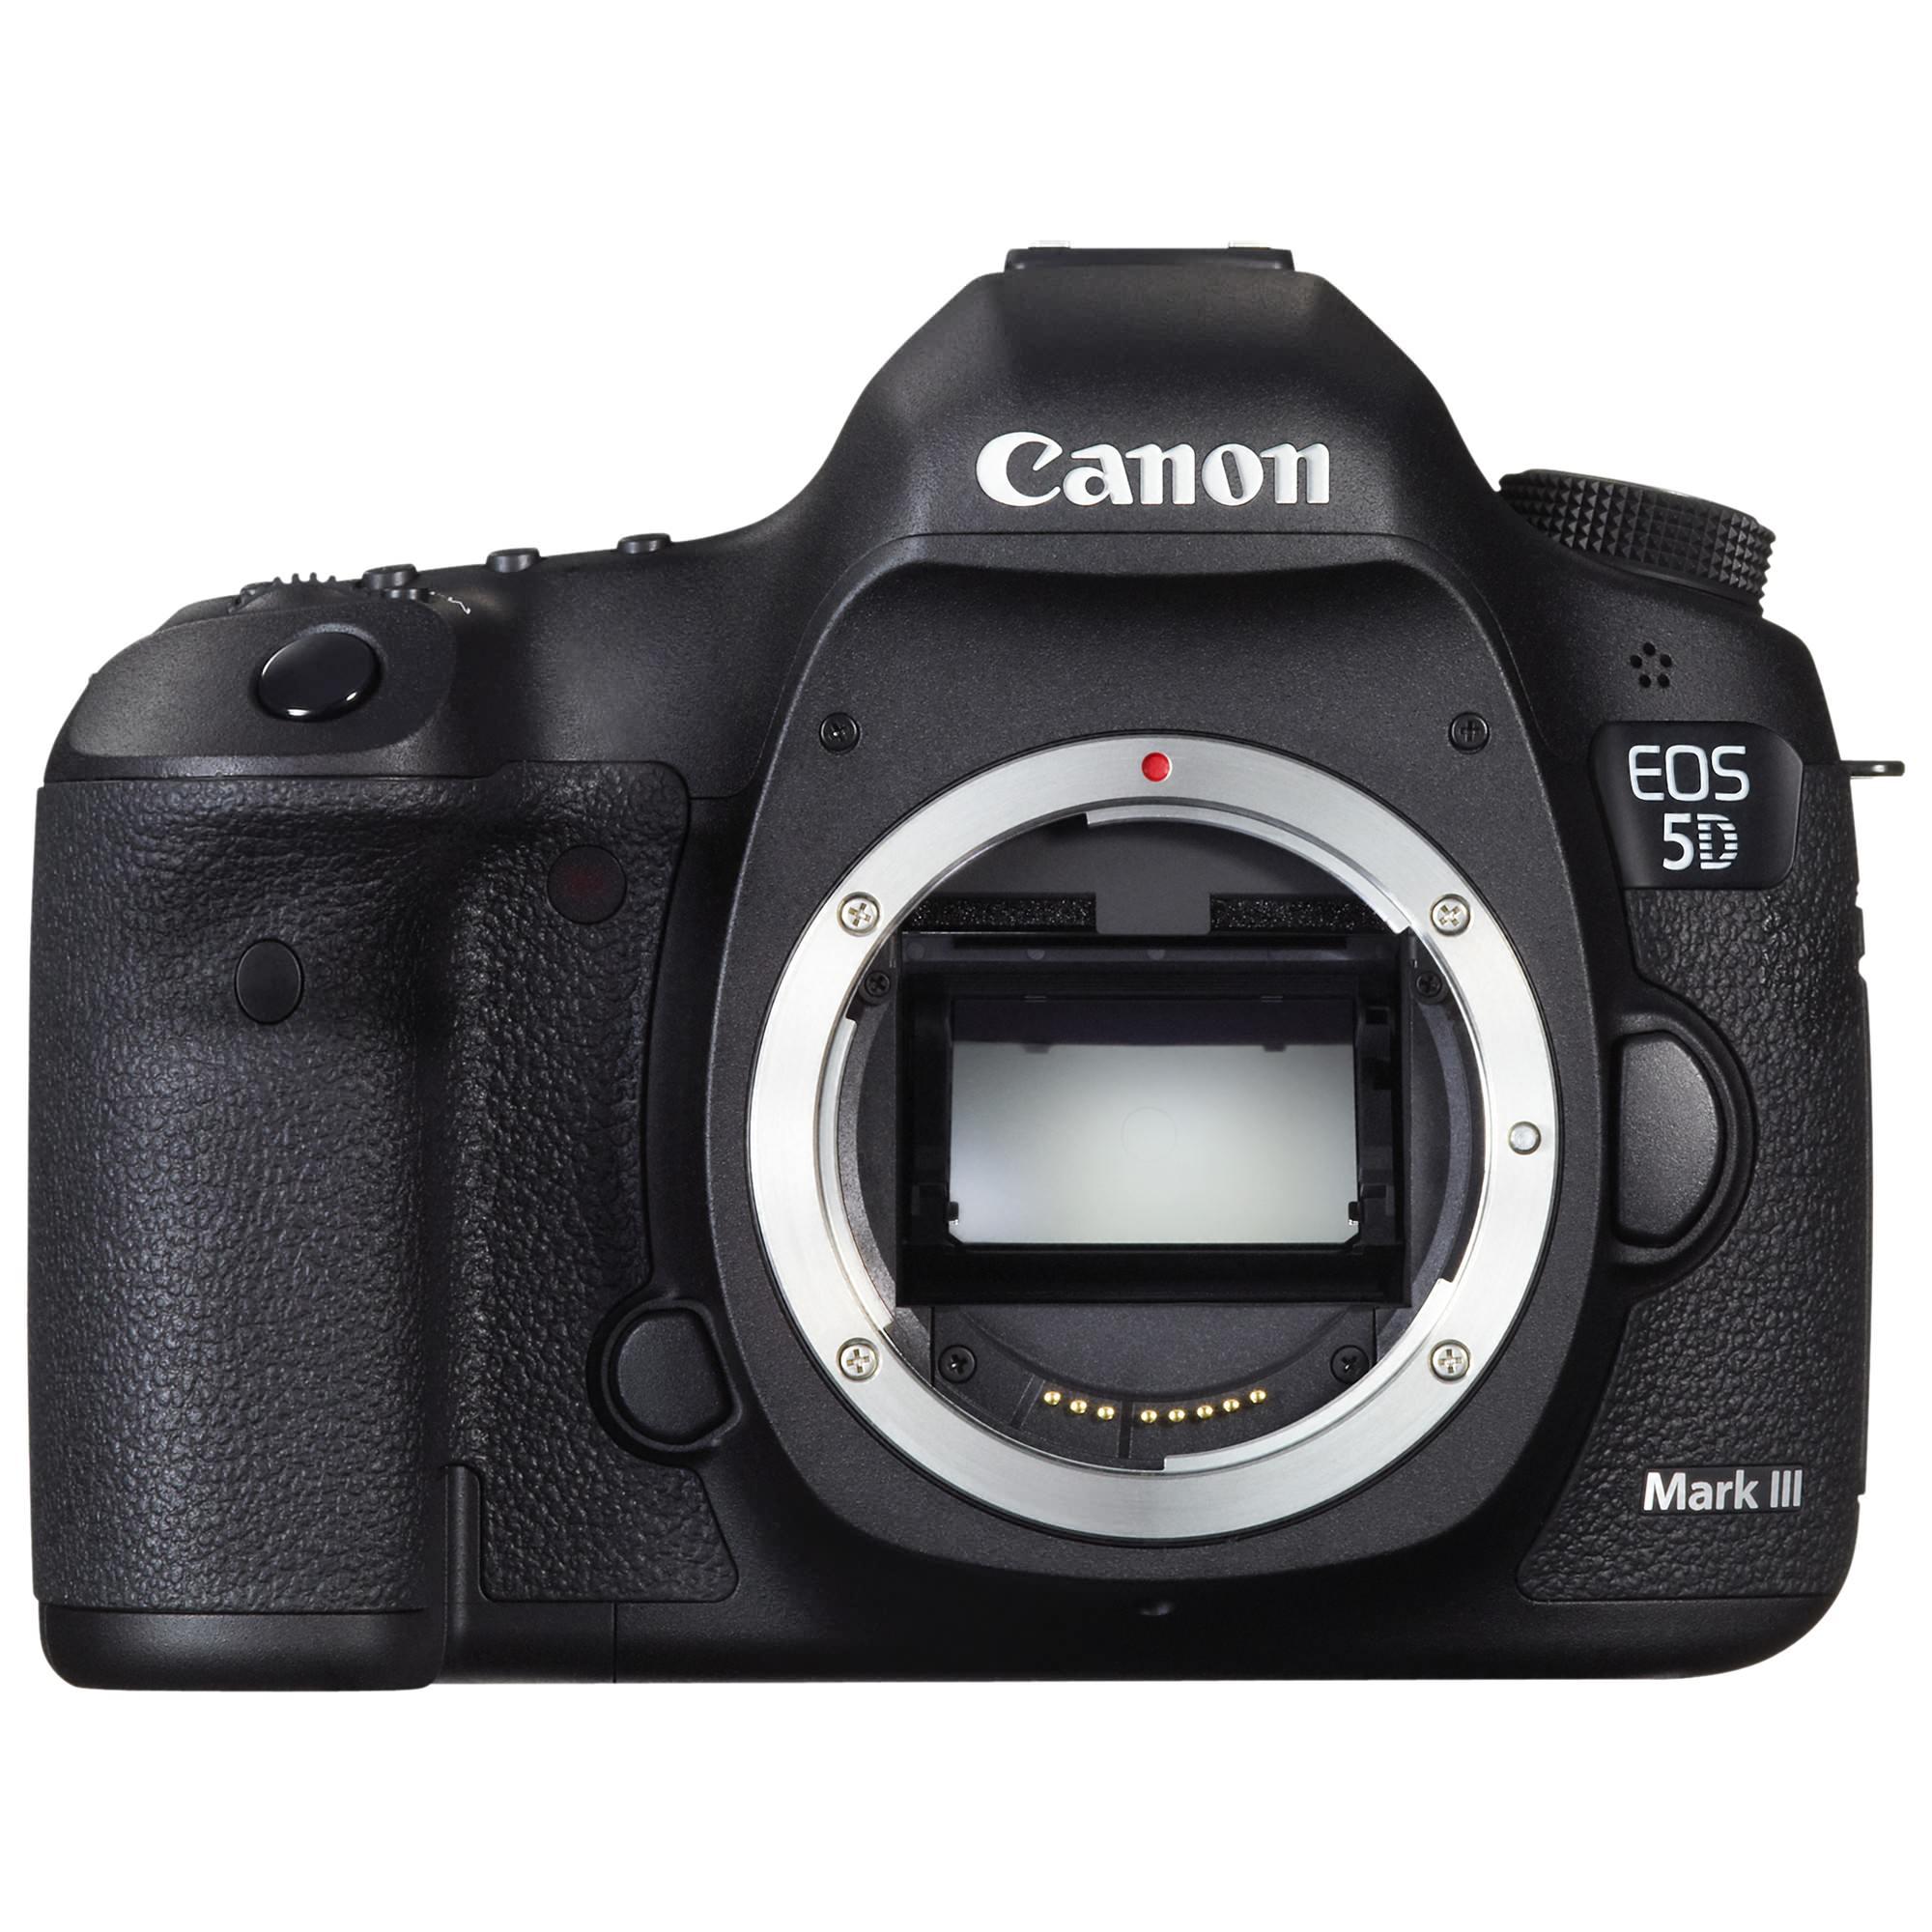 canon eos 5d mark iii 0001 image